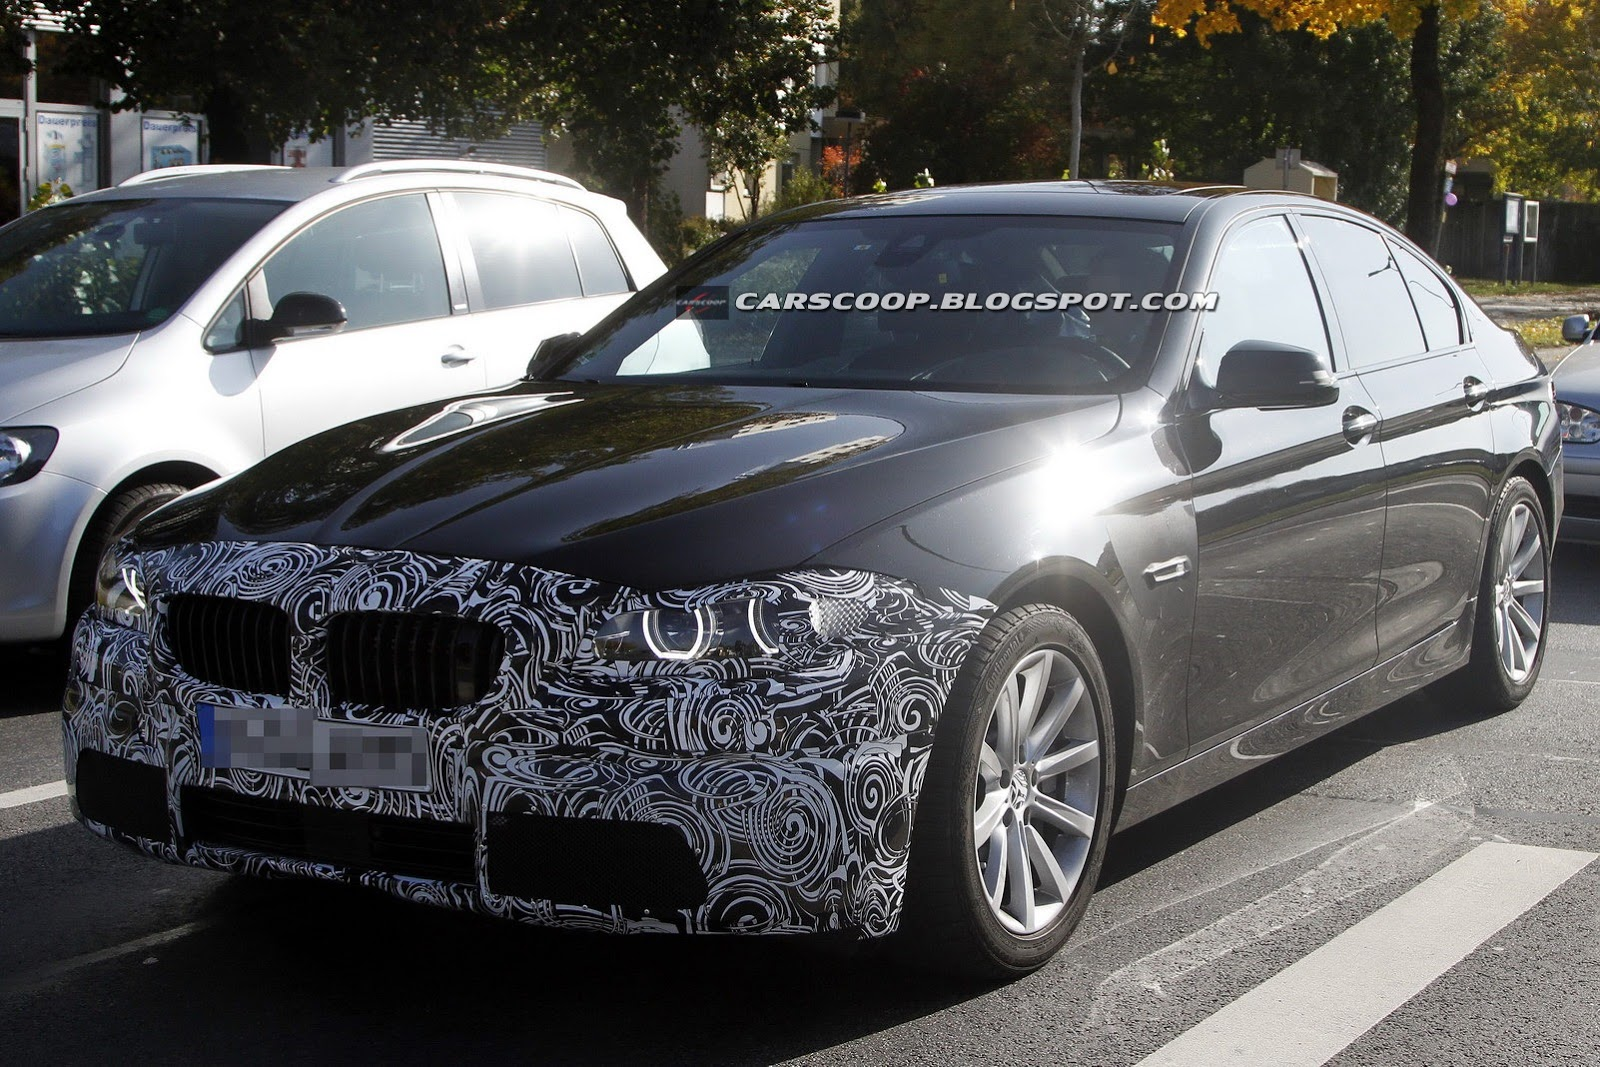 F10 BMW 5 Series refresher